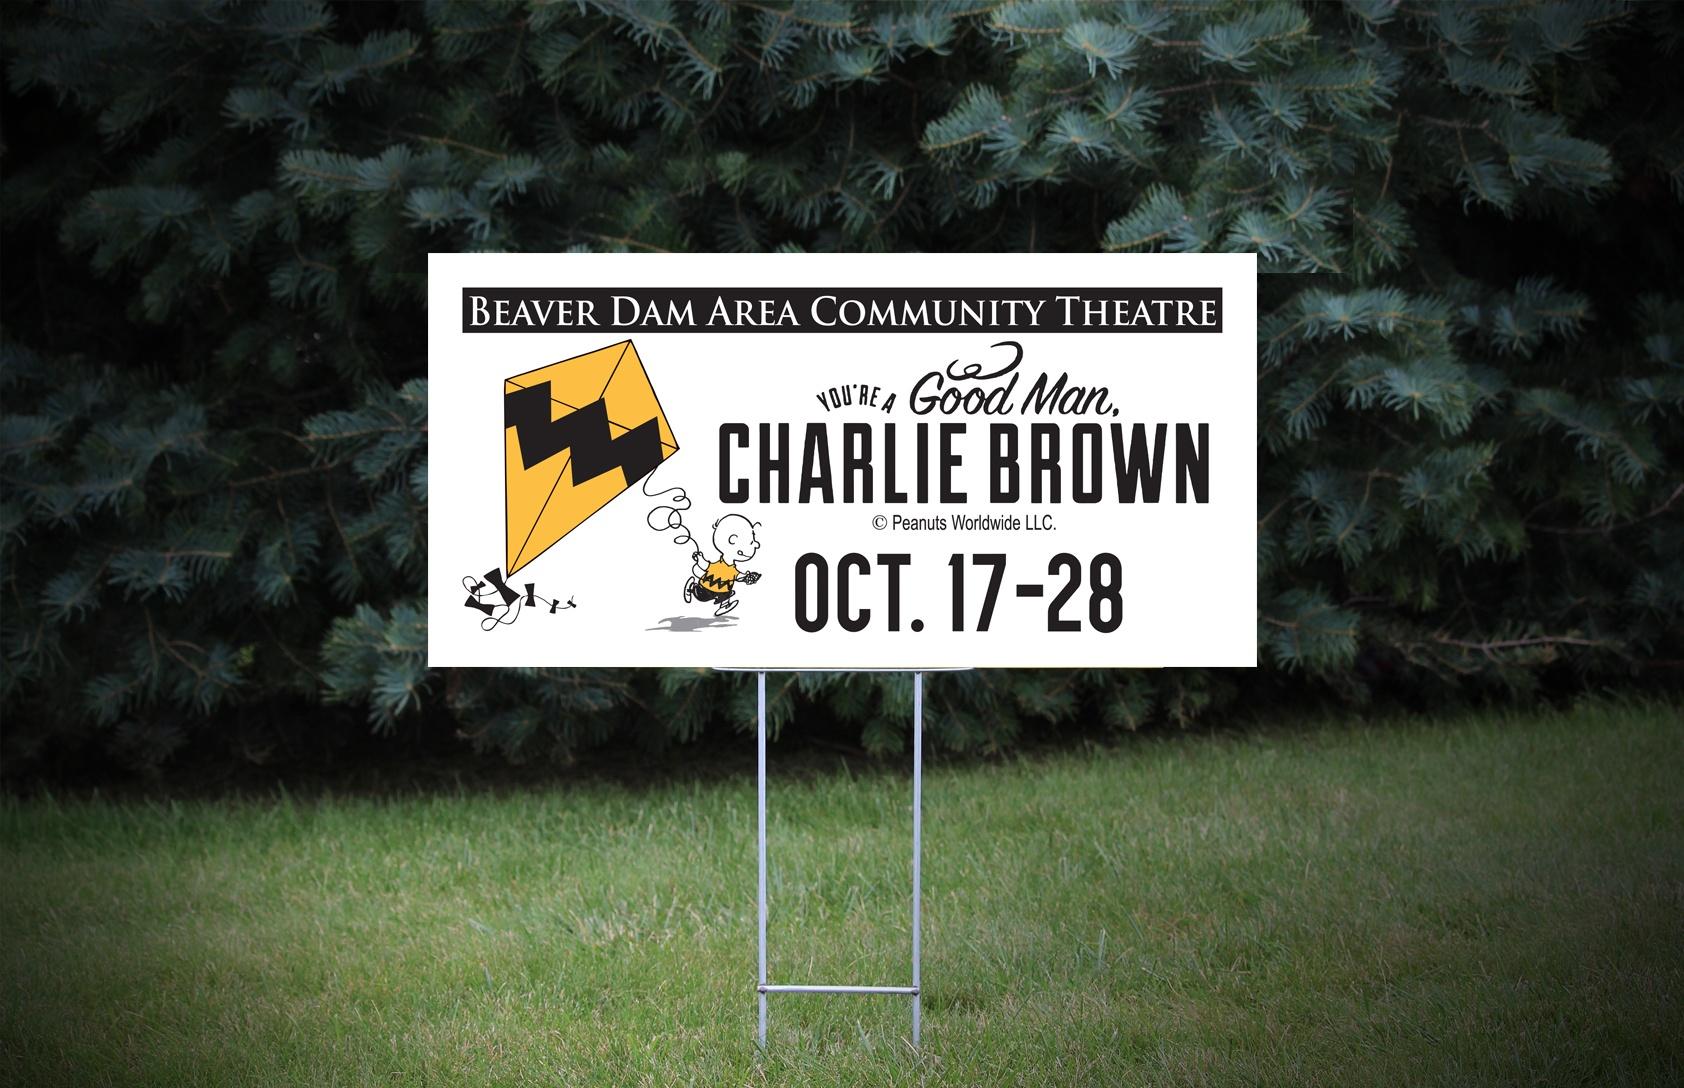 BDACT Charlie Brown 24″ x 12″ Coroplast Signs – Design